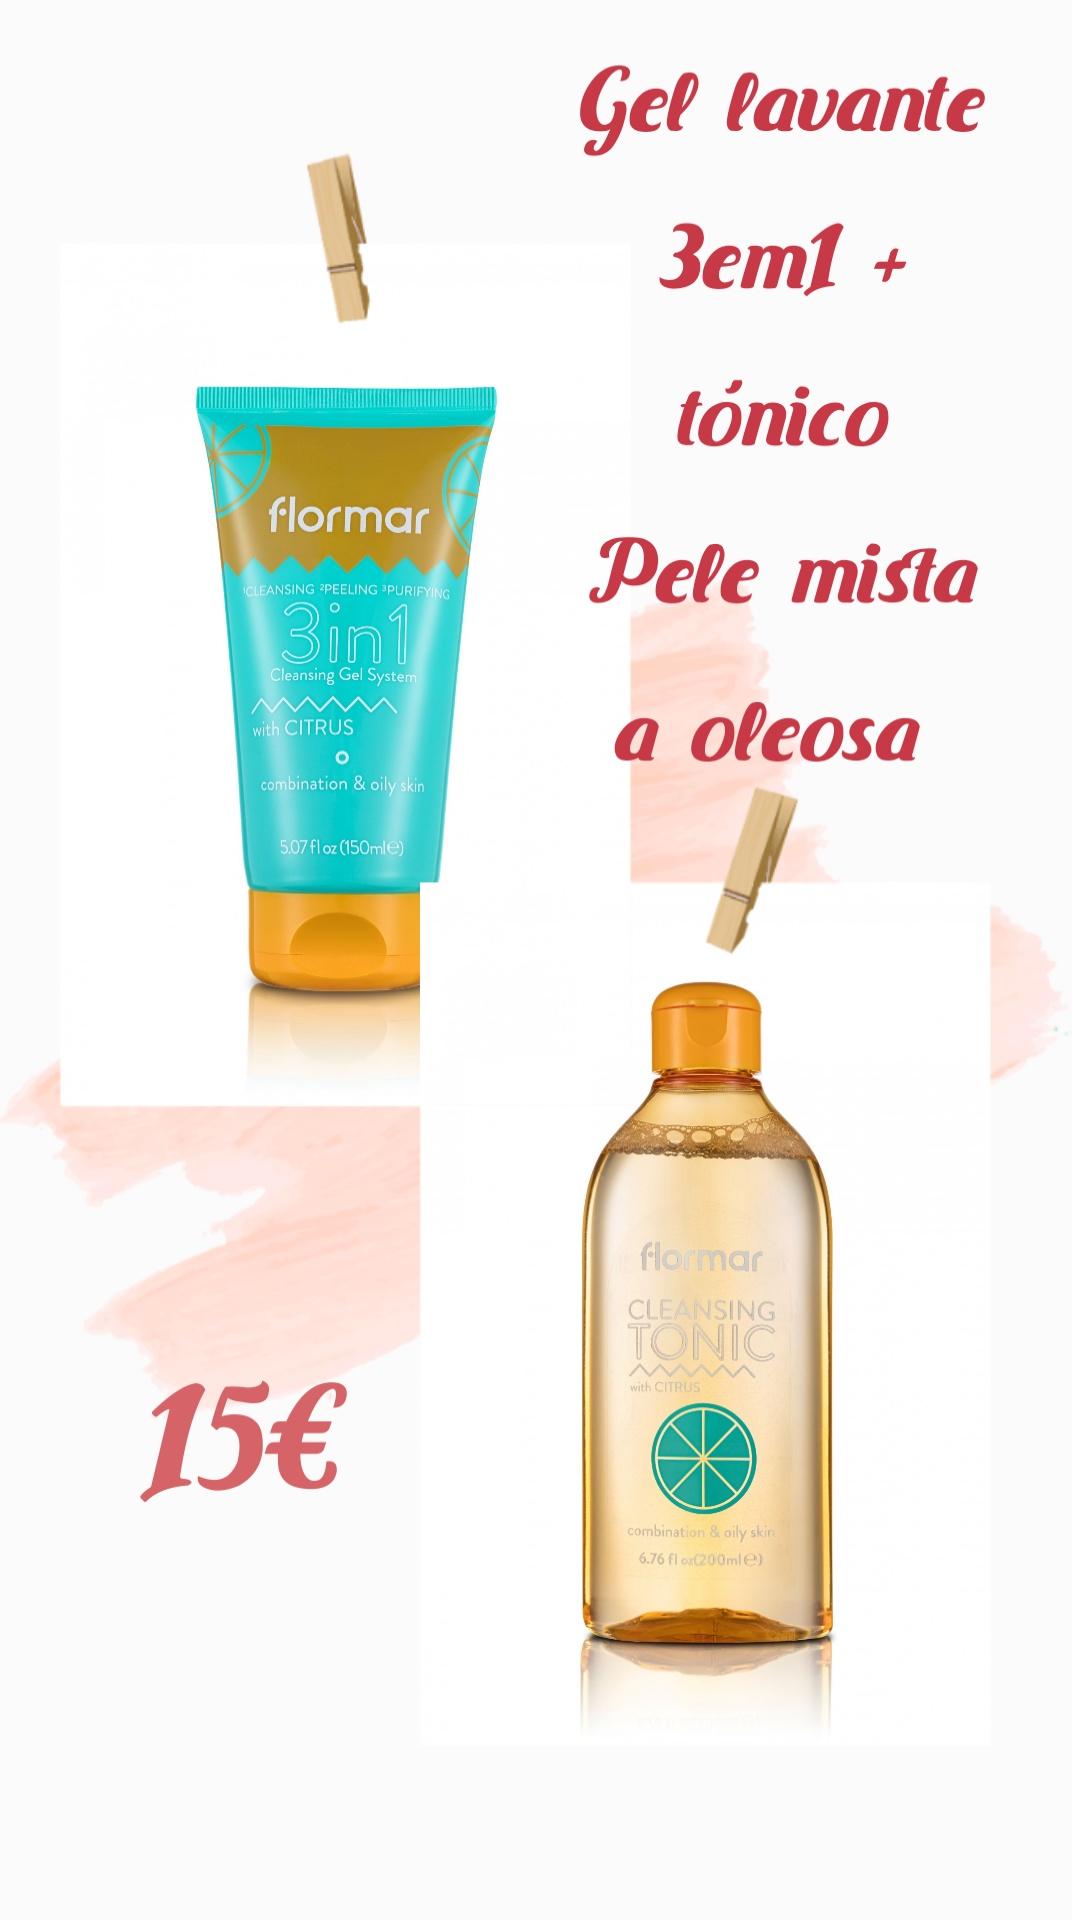 Flormar Kit Skin Care Pele mista a oleosa